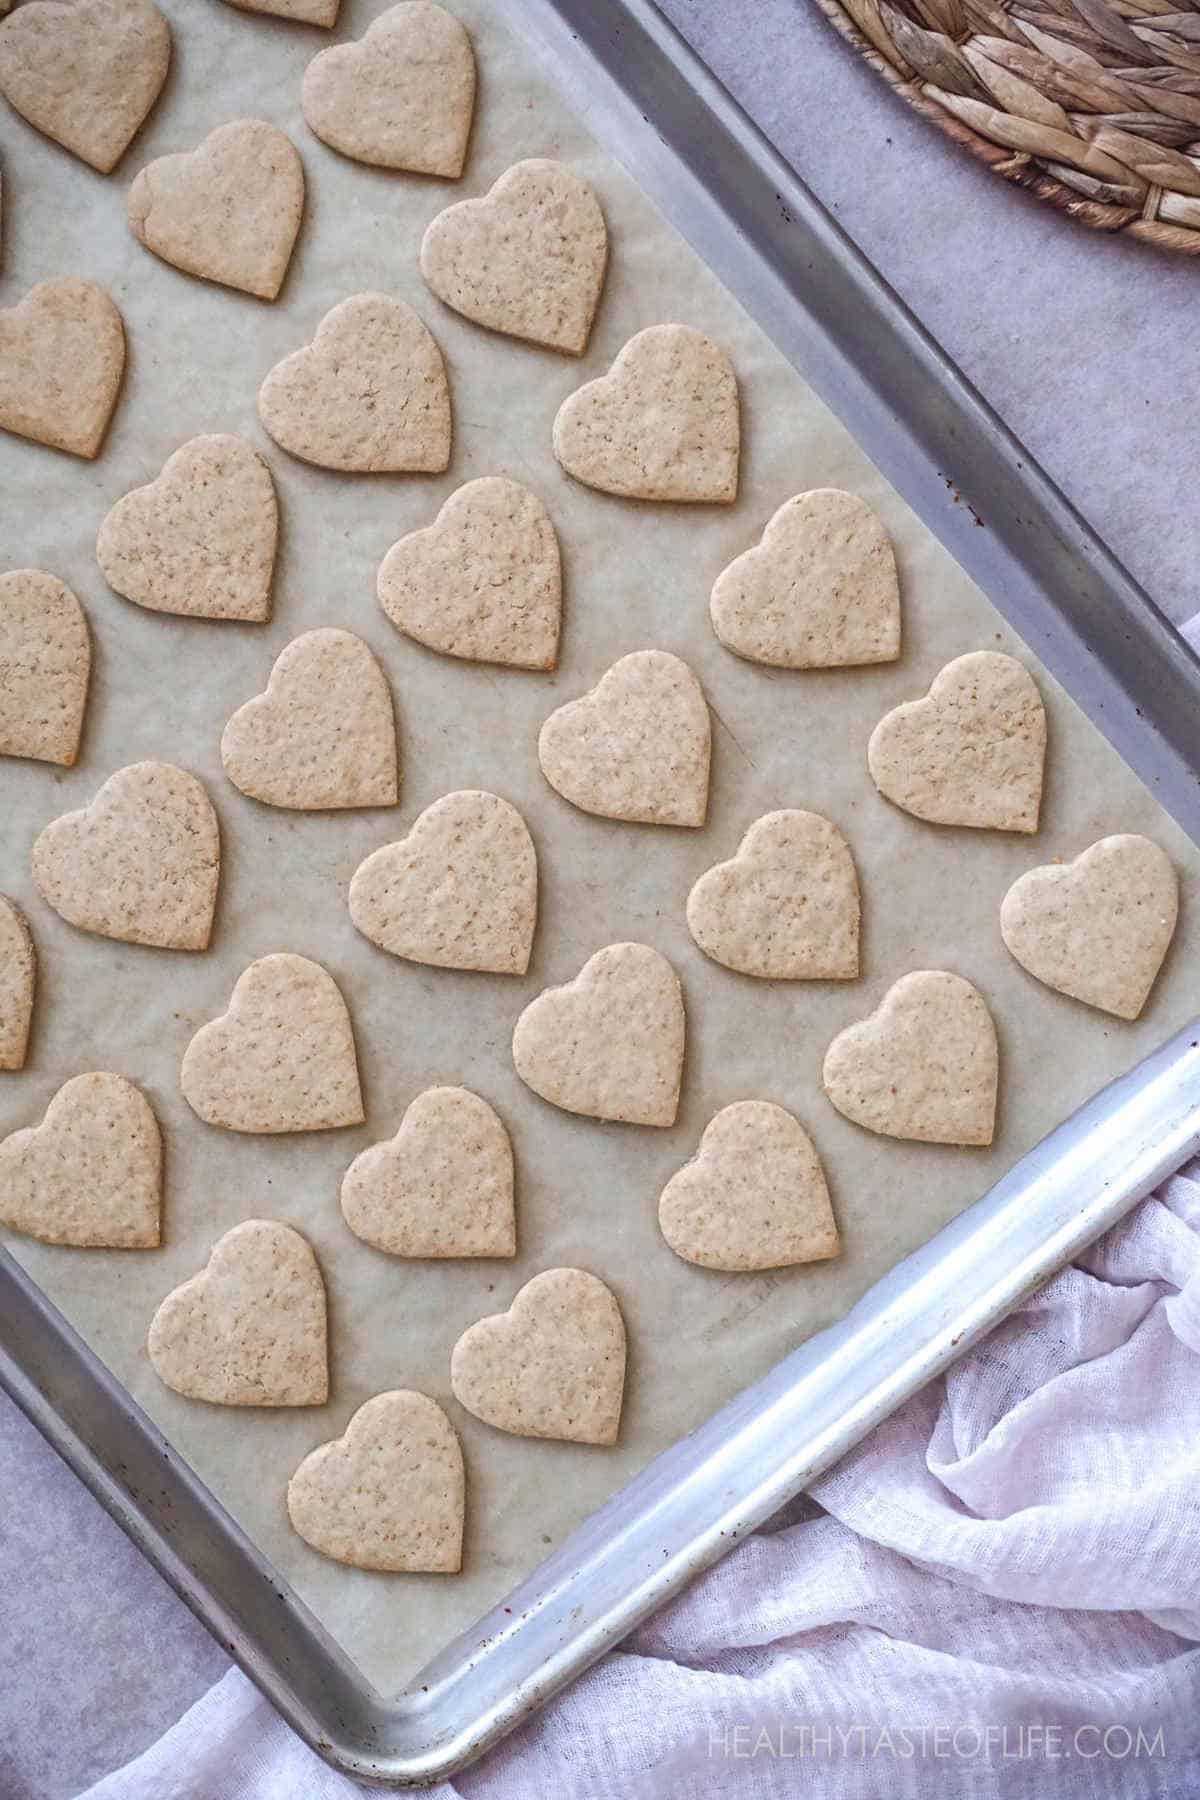 Healthy Vegan Gluten Free Heart Shaped Cookies on  a baking sheet